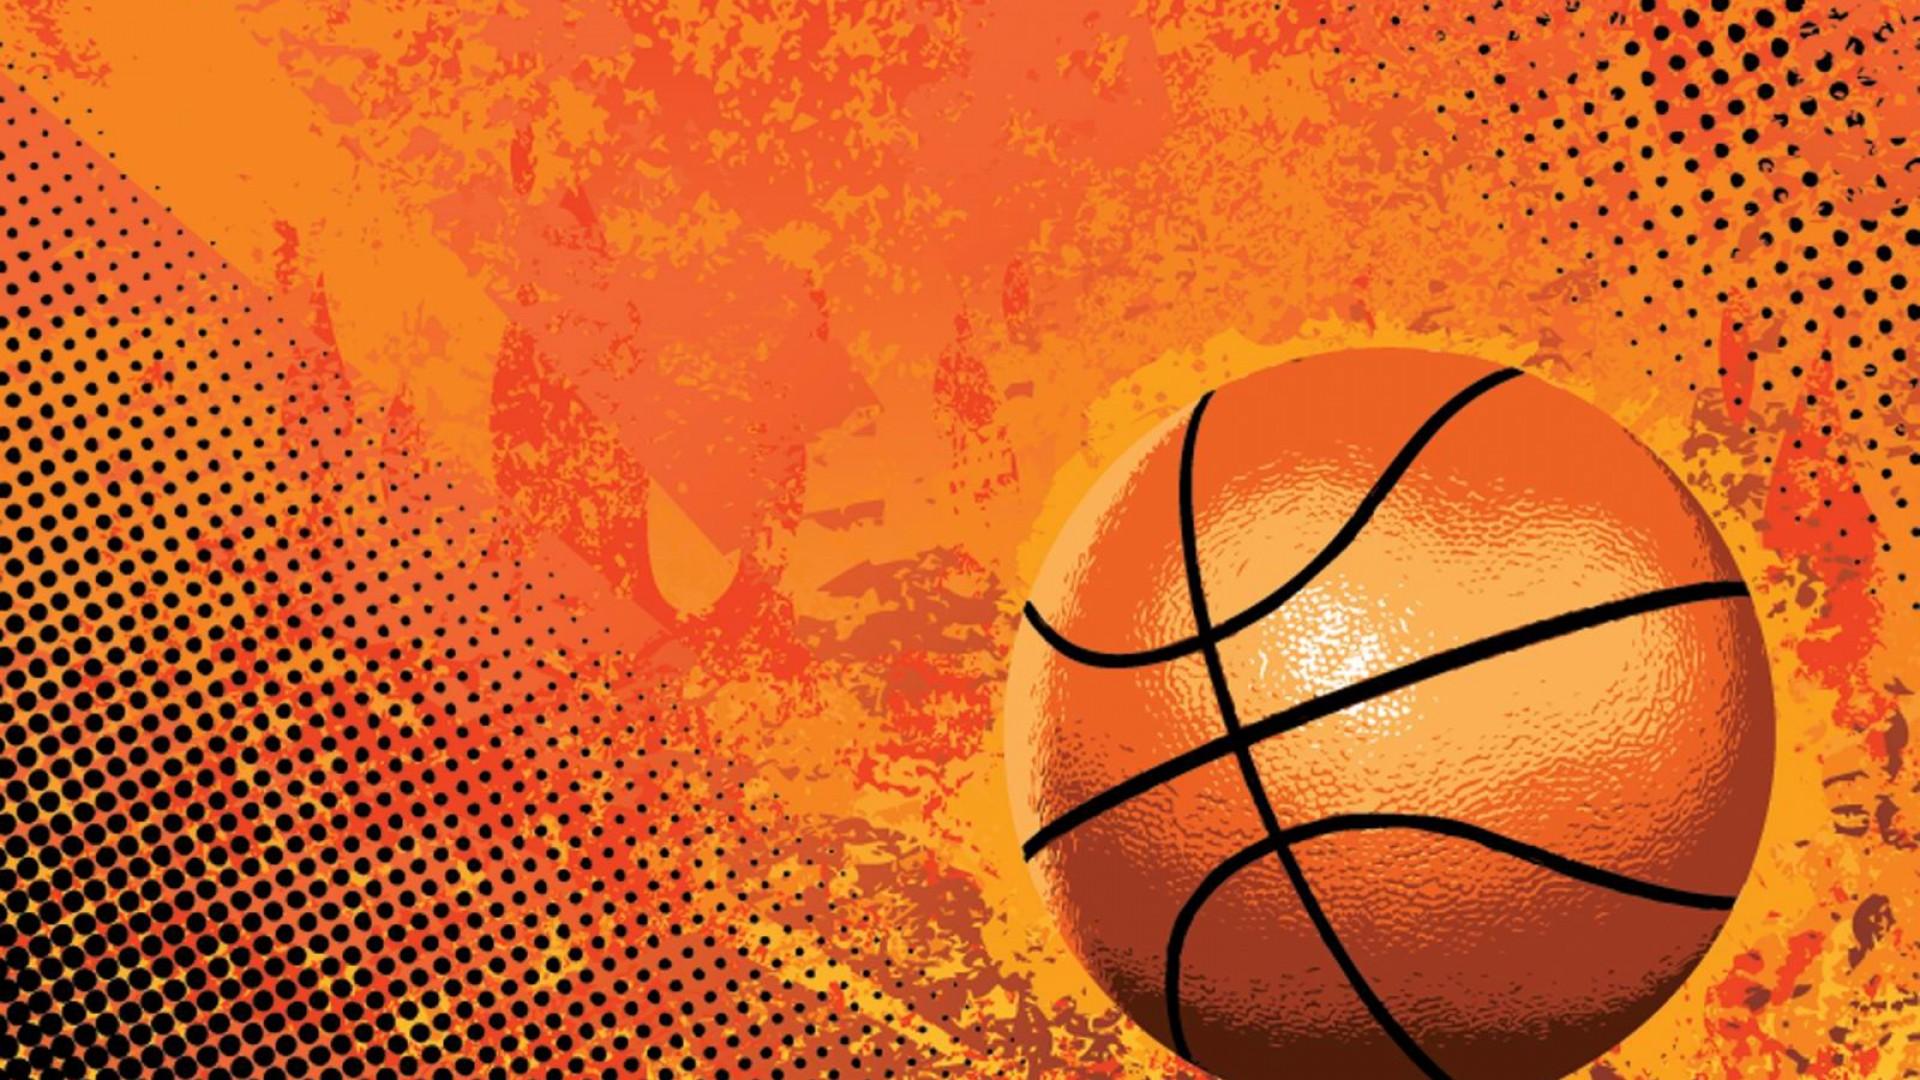 1280x960px Basketball Background | #302686